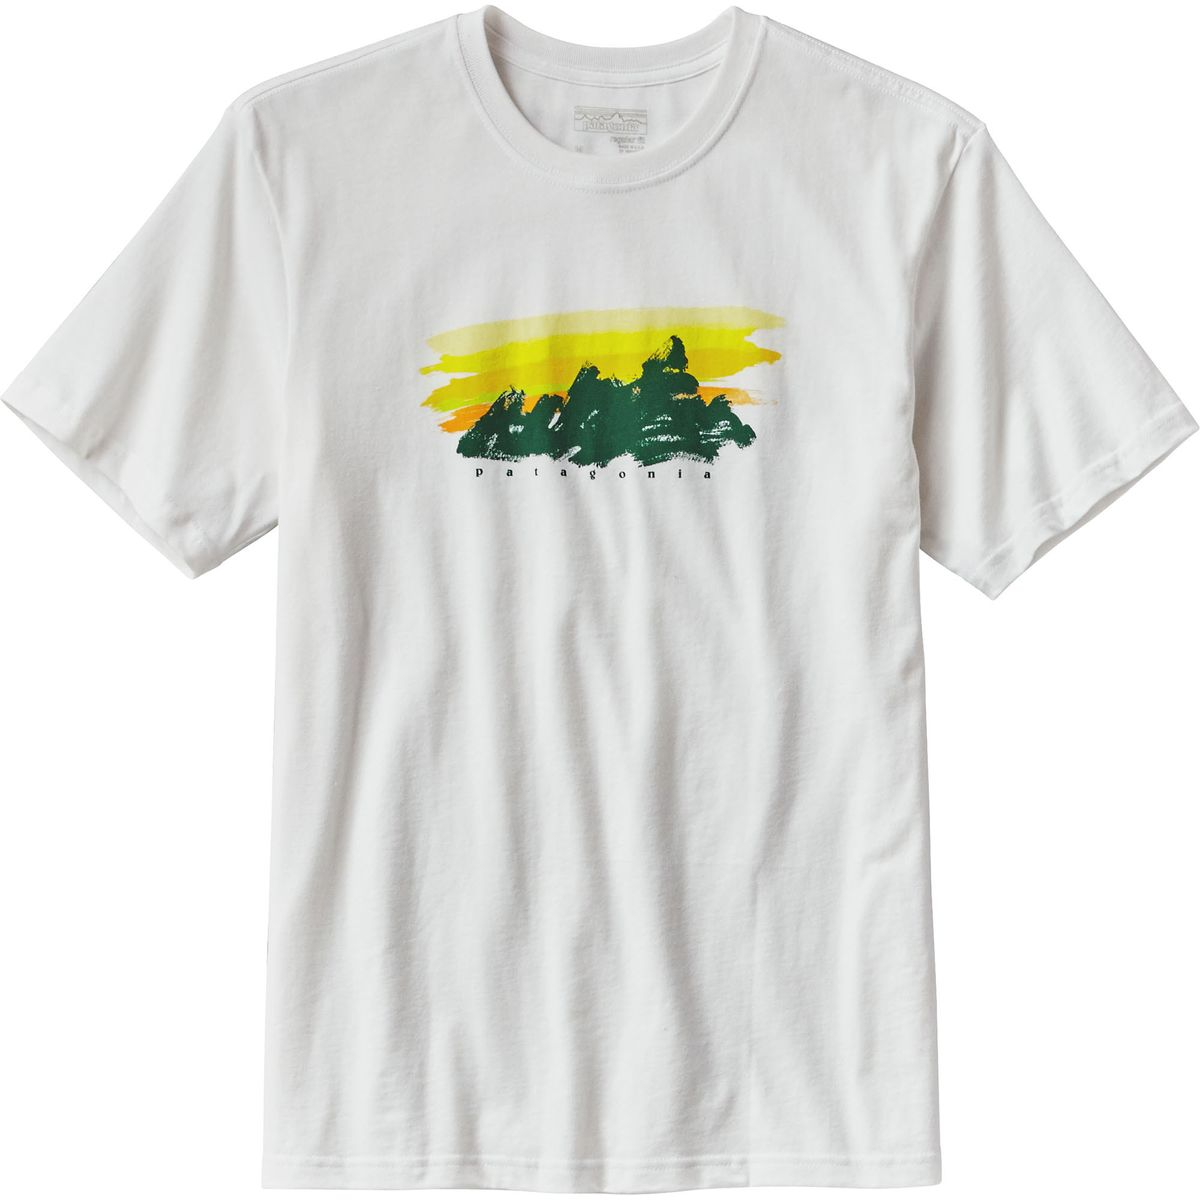 Patagonia Painted Fitz Roy T-Shirt - Short-Sleeve - Men